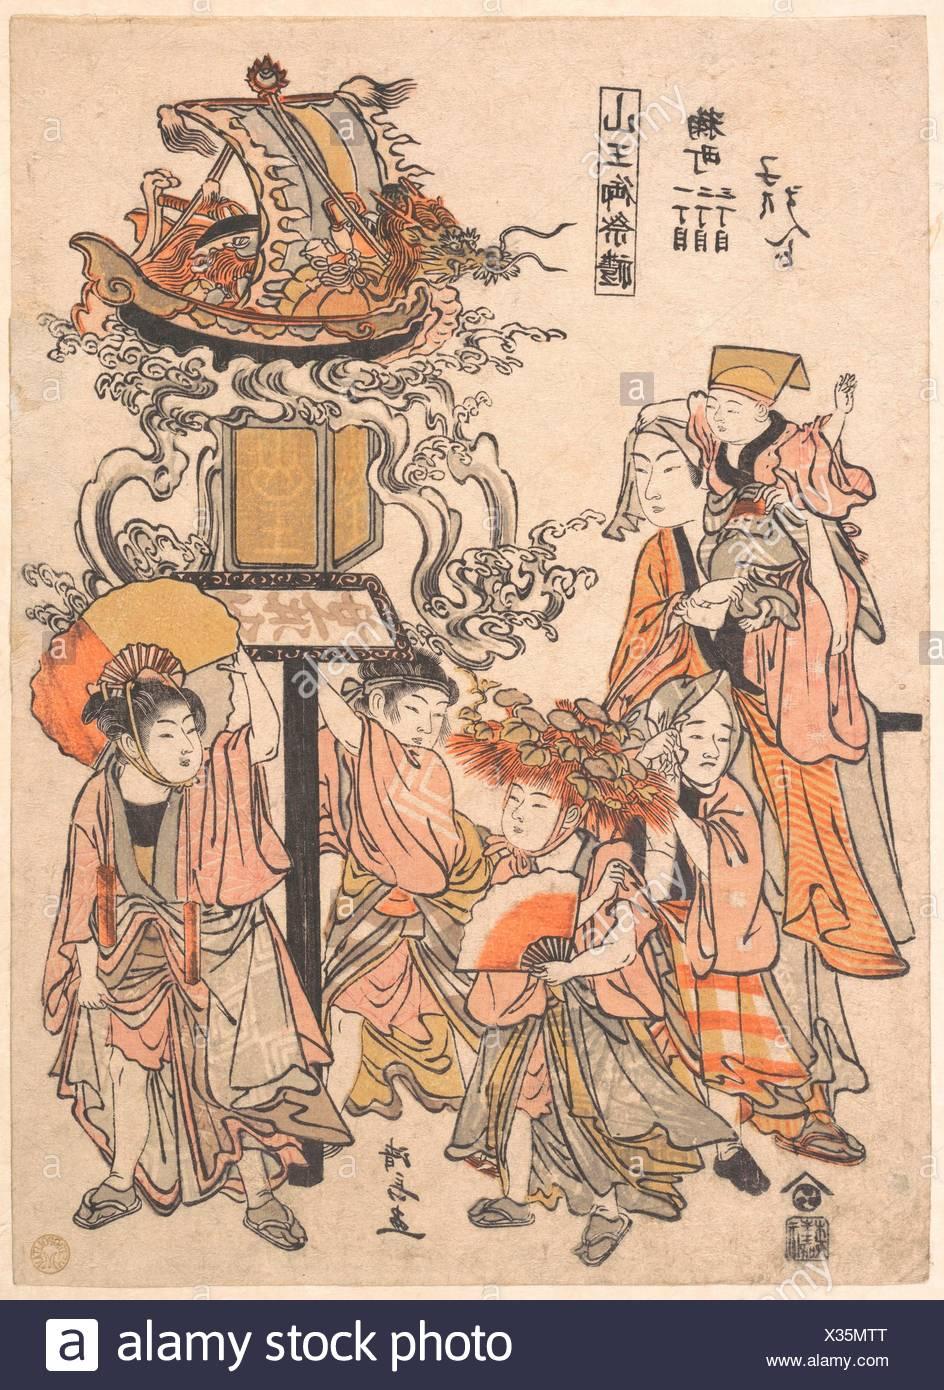 Kodomo Mando, Kojimachi 1,2, 3-chome, Sanno Gehen - sairei/Childrens' Laterne Schweben, Kojimachi 1,2, 3-chome Block Association, Sanno Festival. Artist: Stockbild